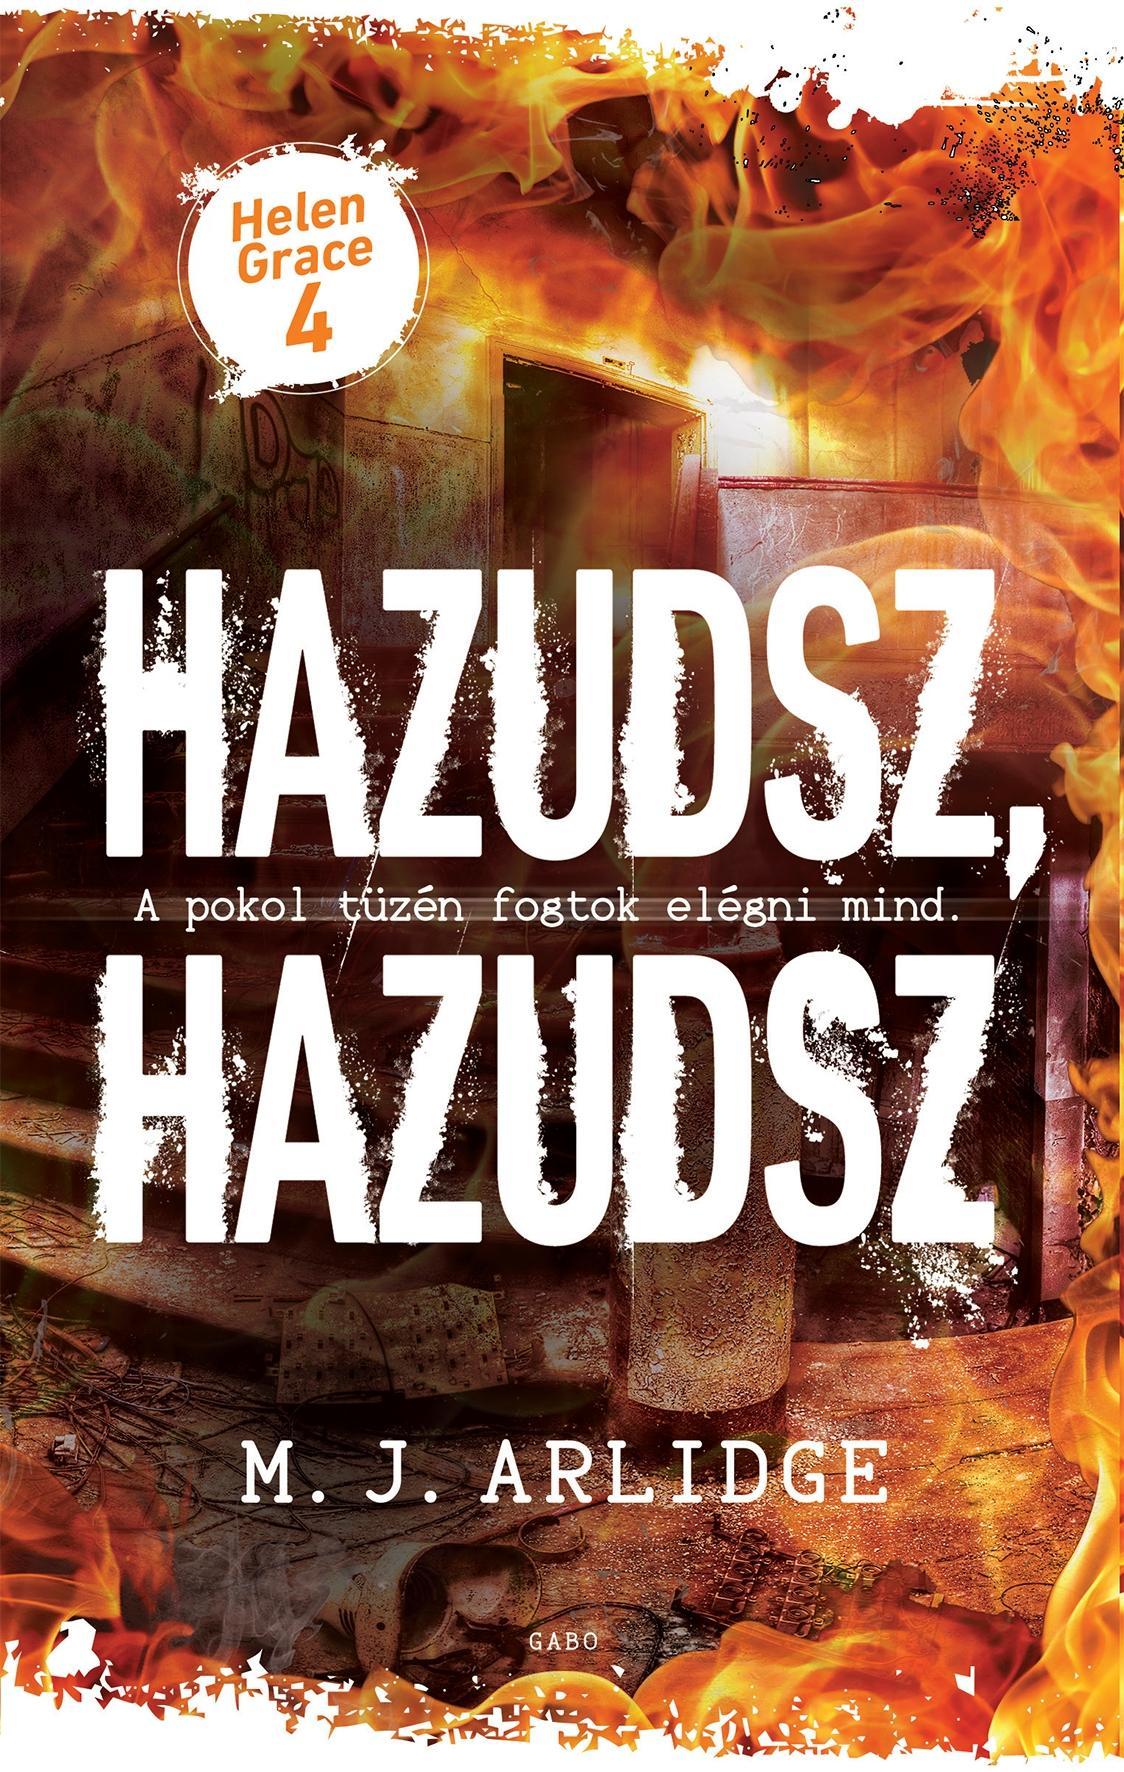 ARLIDGE, M.J. - HAZUDSZ, HAZUDSZ - HELEN GRACE 4.